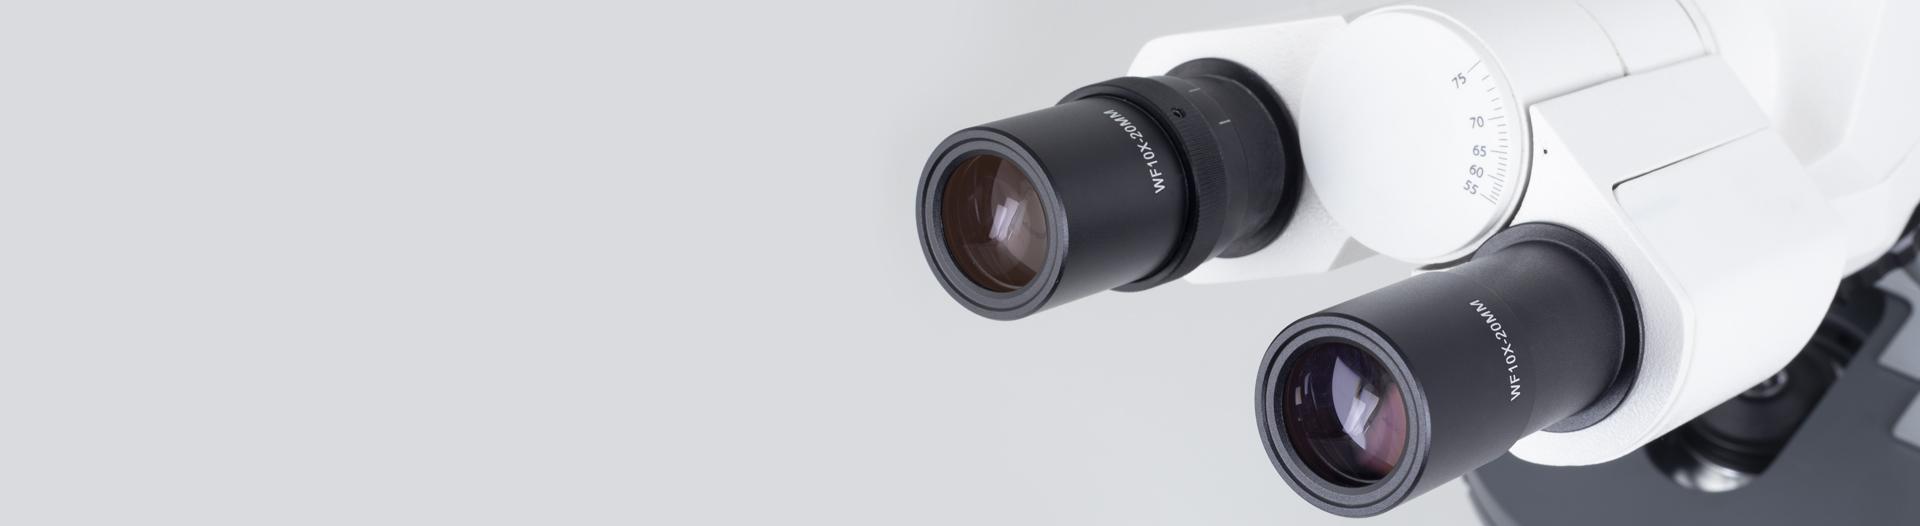 SILVER 250 microscope Optics